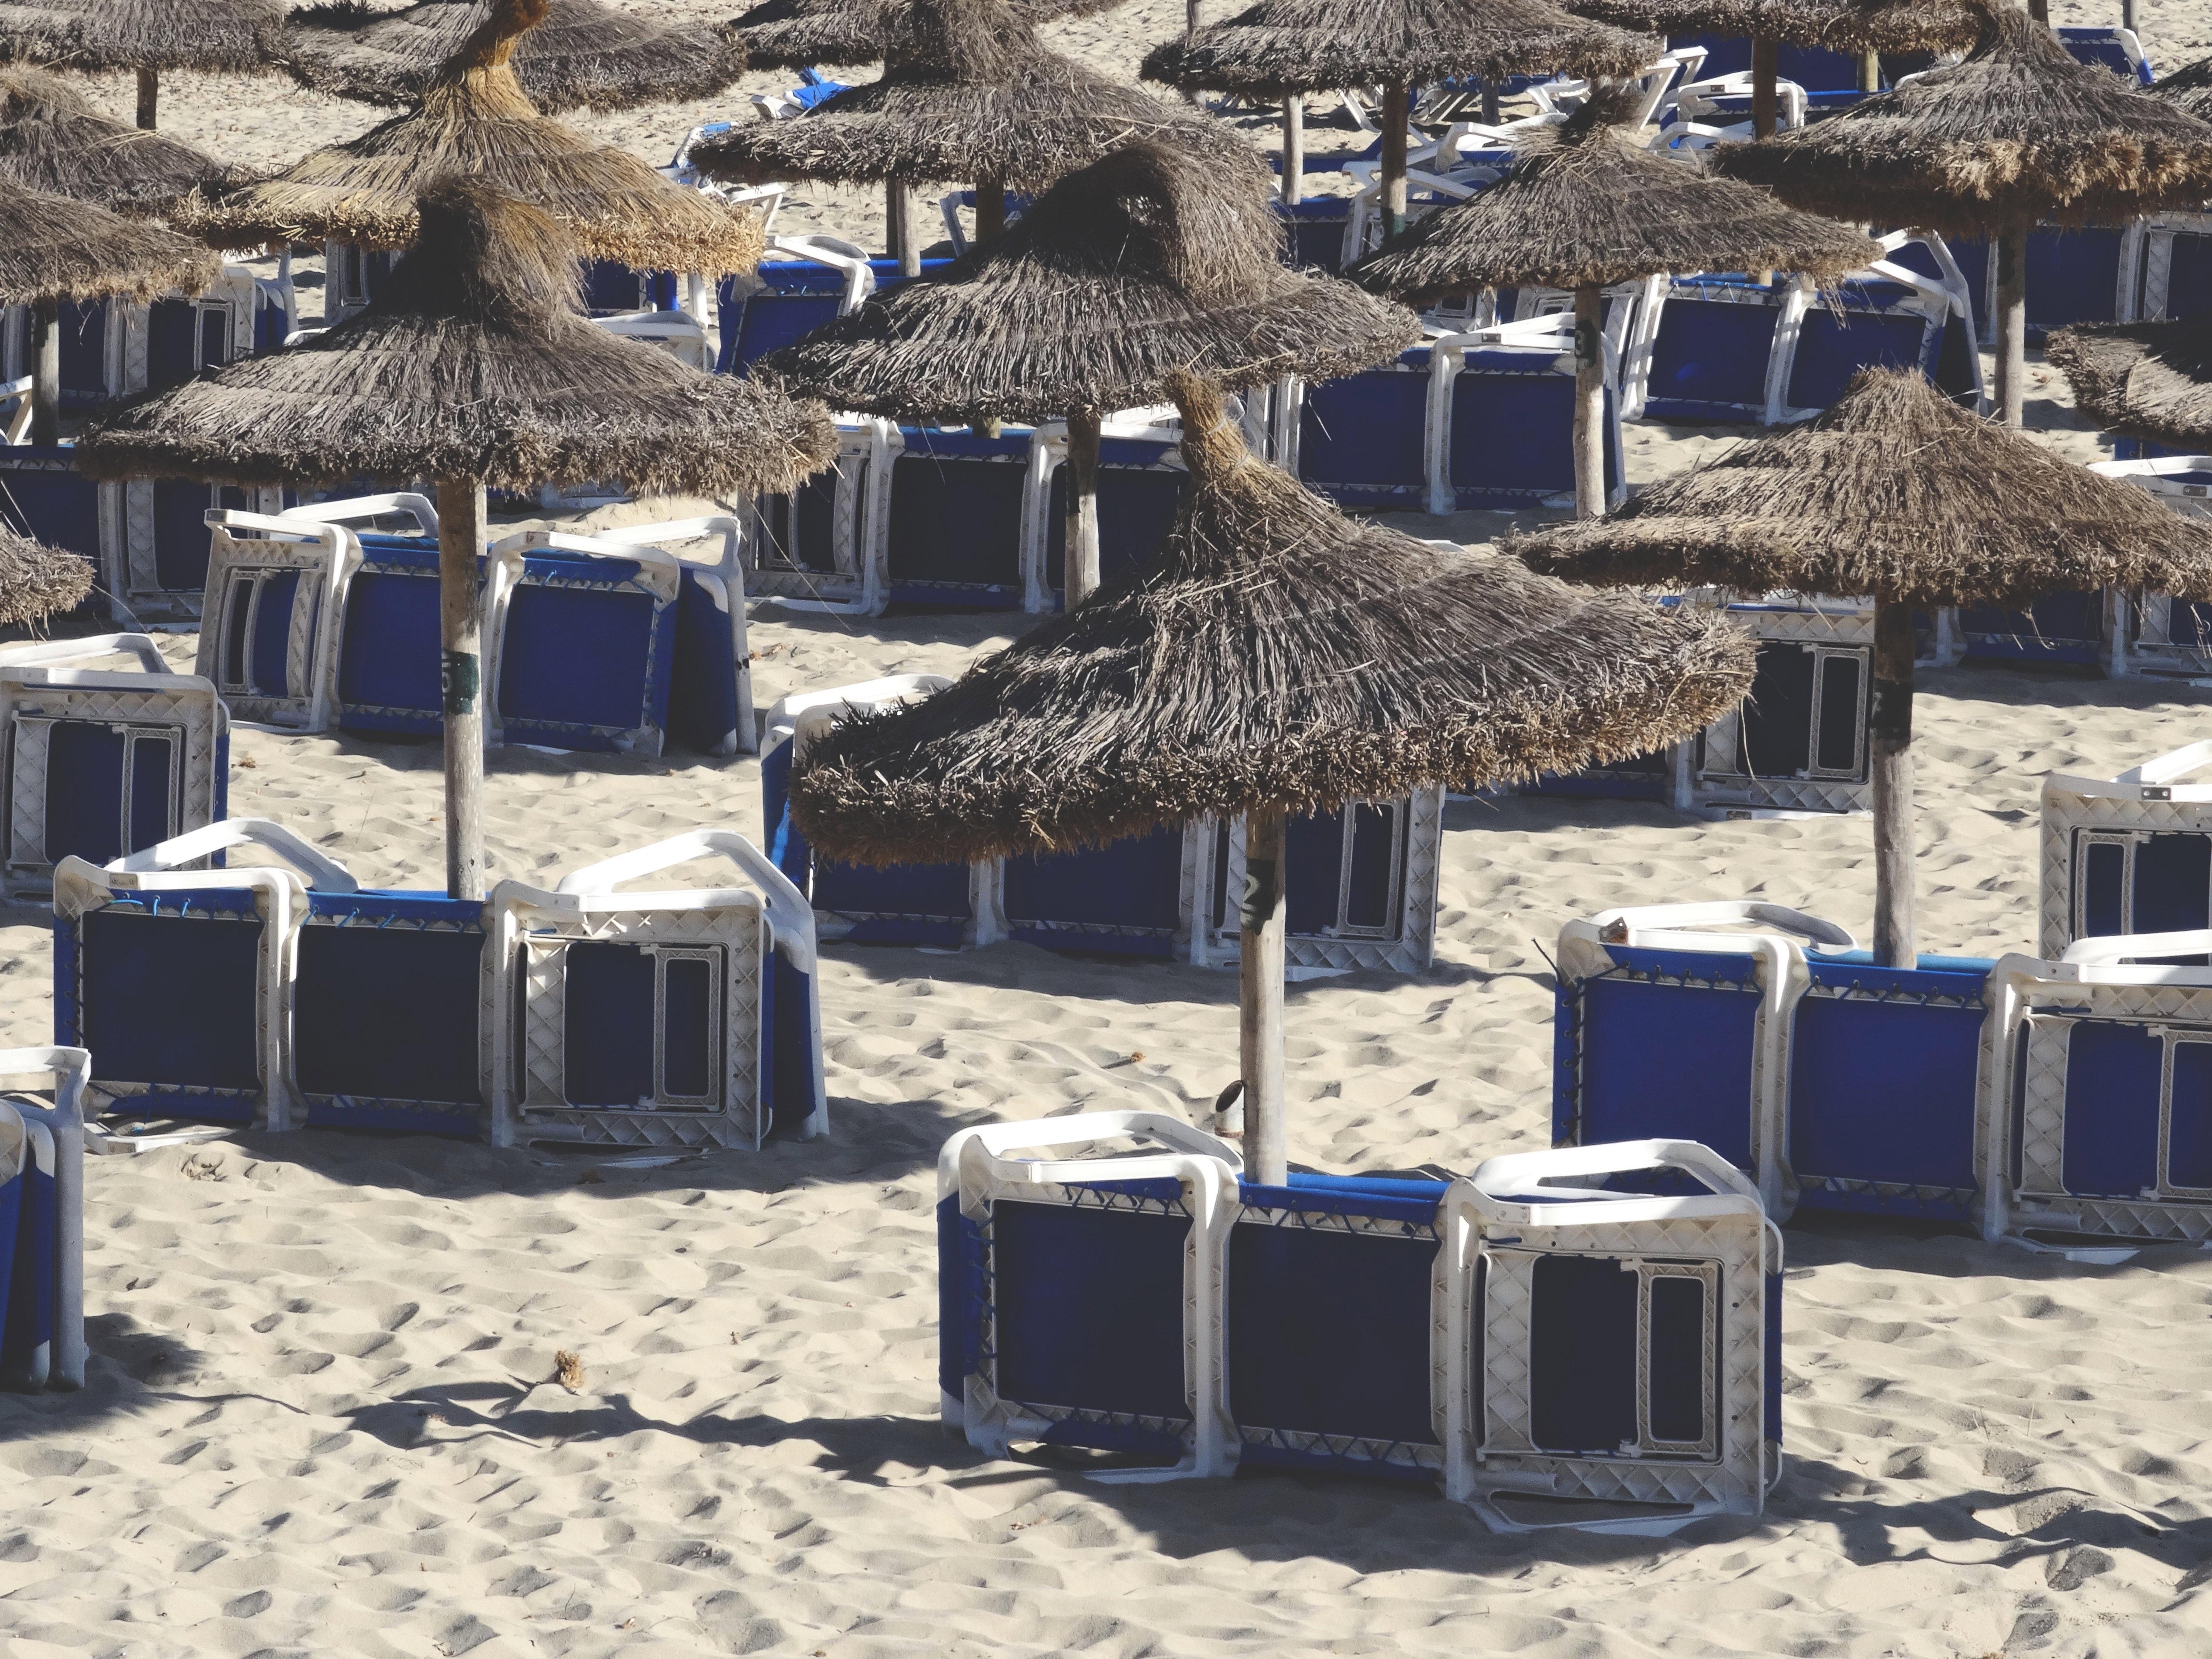 beach sand snow winter summer hut village christmas decoration umbrellas lounge chairs